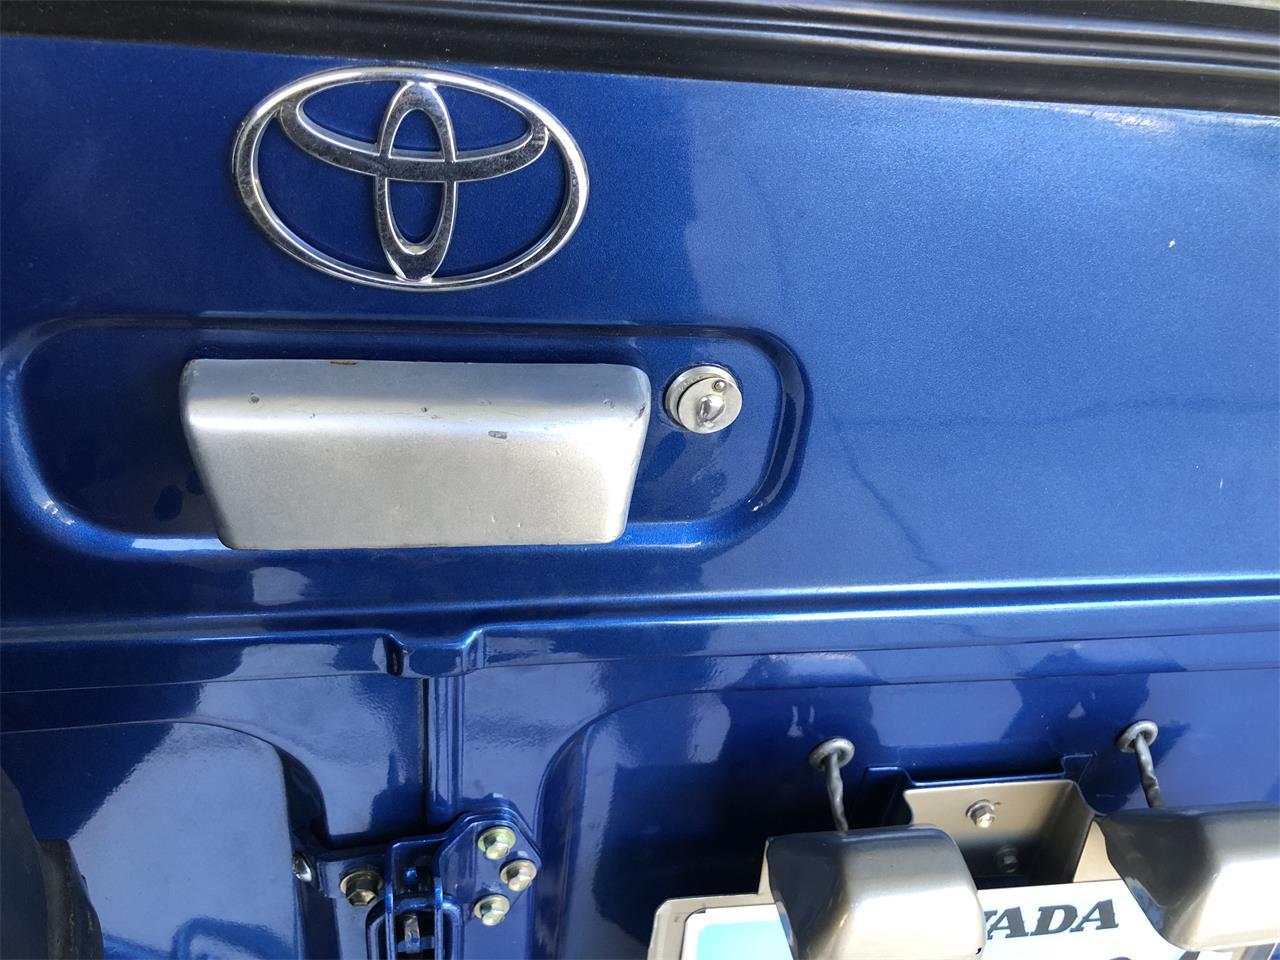 1985 Toyota Land Cruiser FJ (CC-1294660) for sale in El Dorado Hills, California